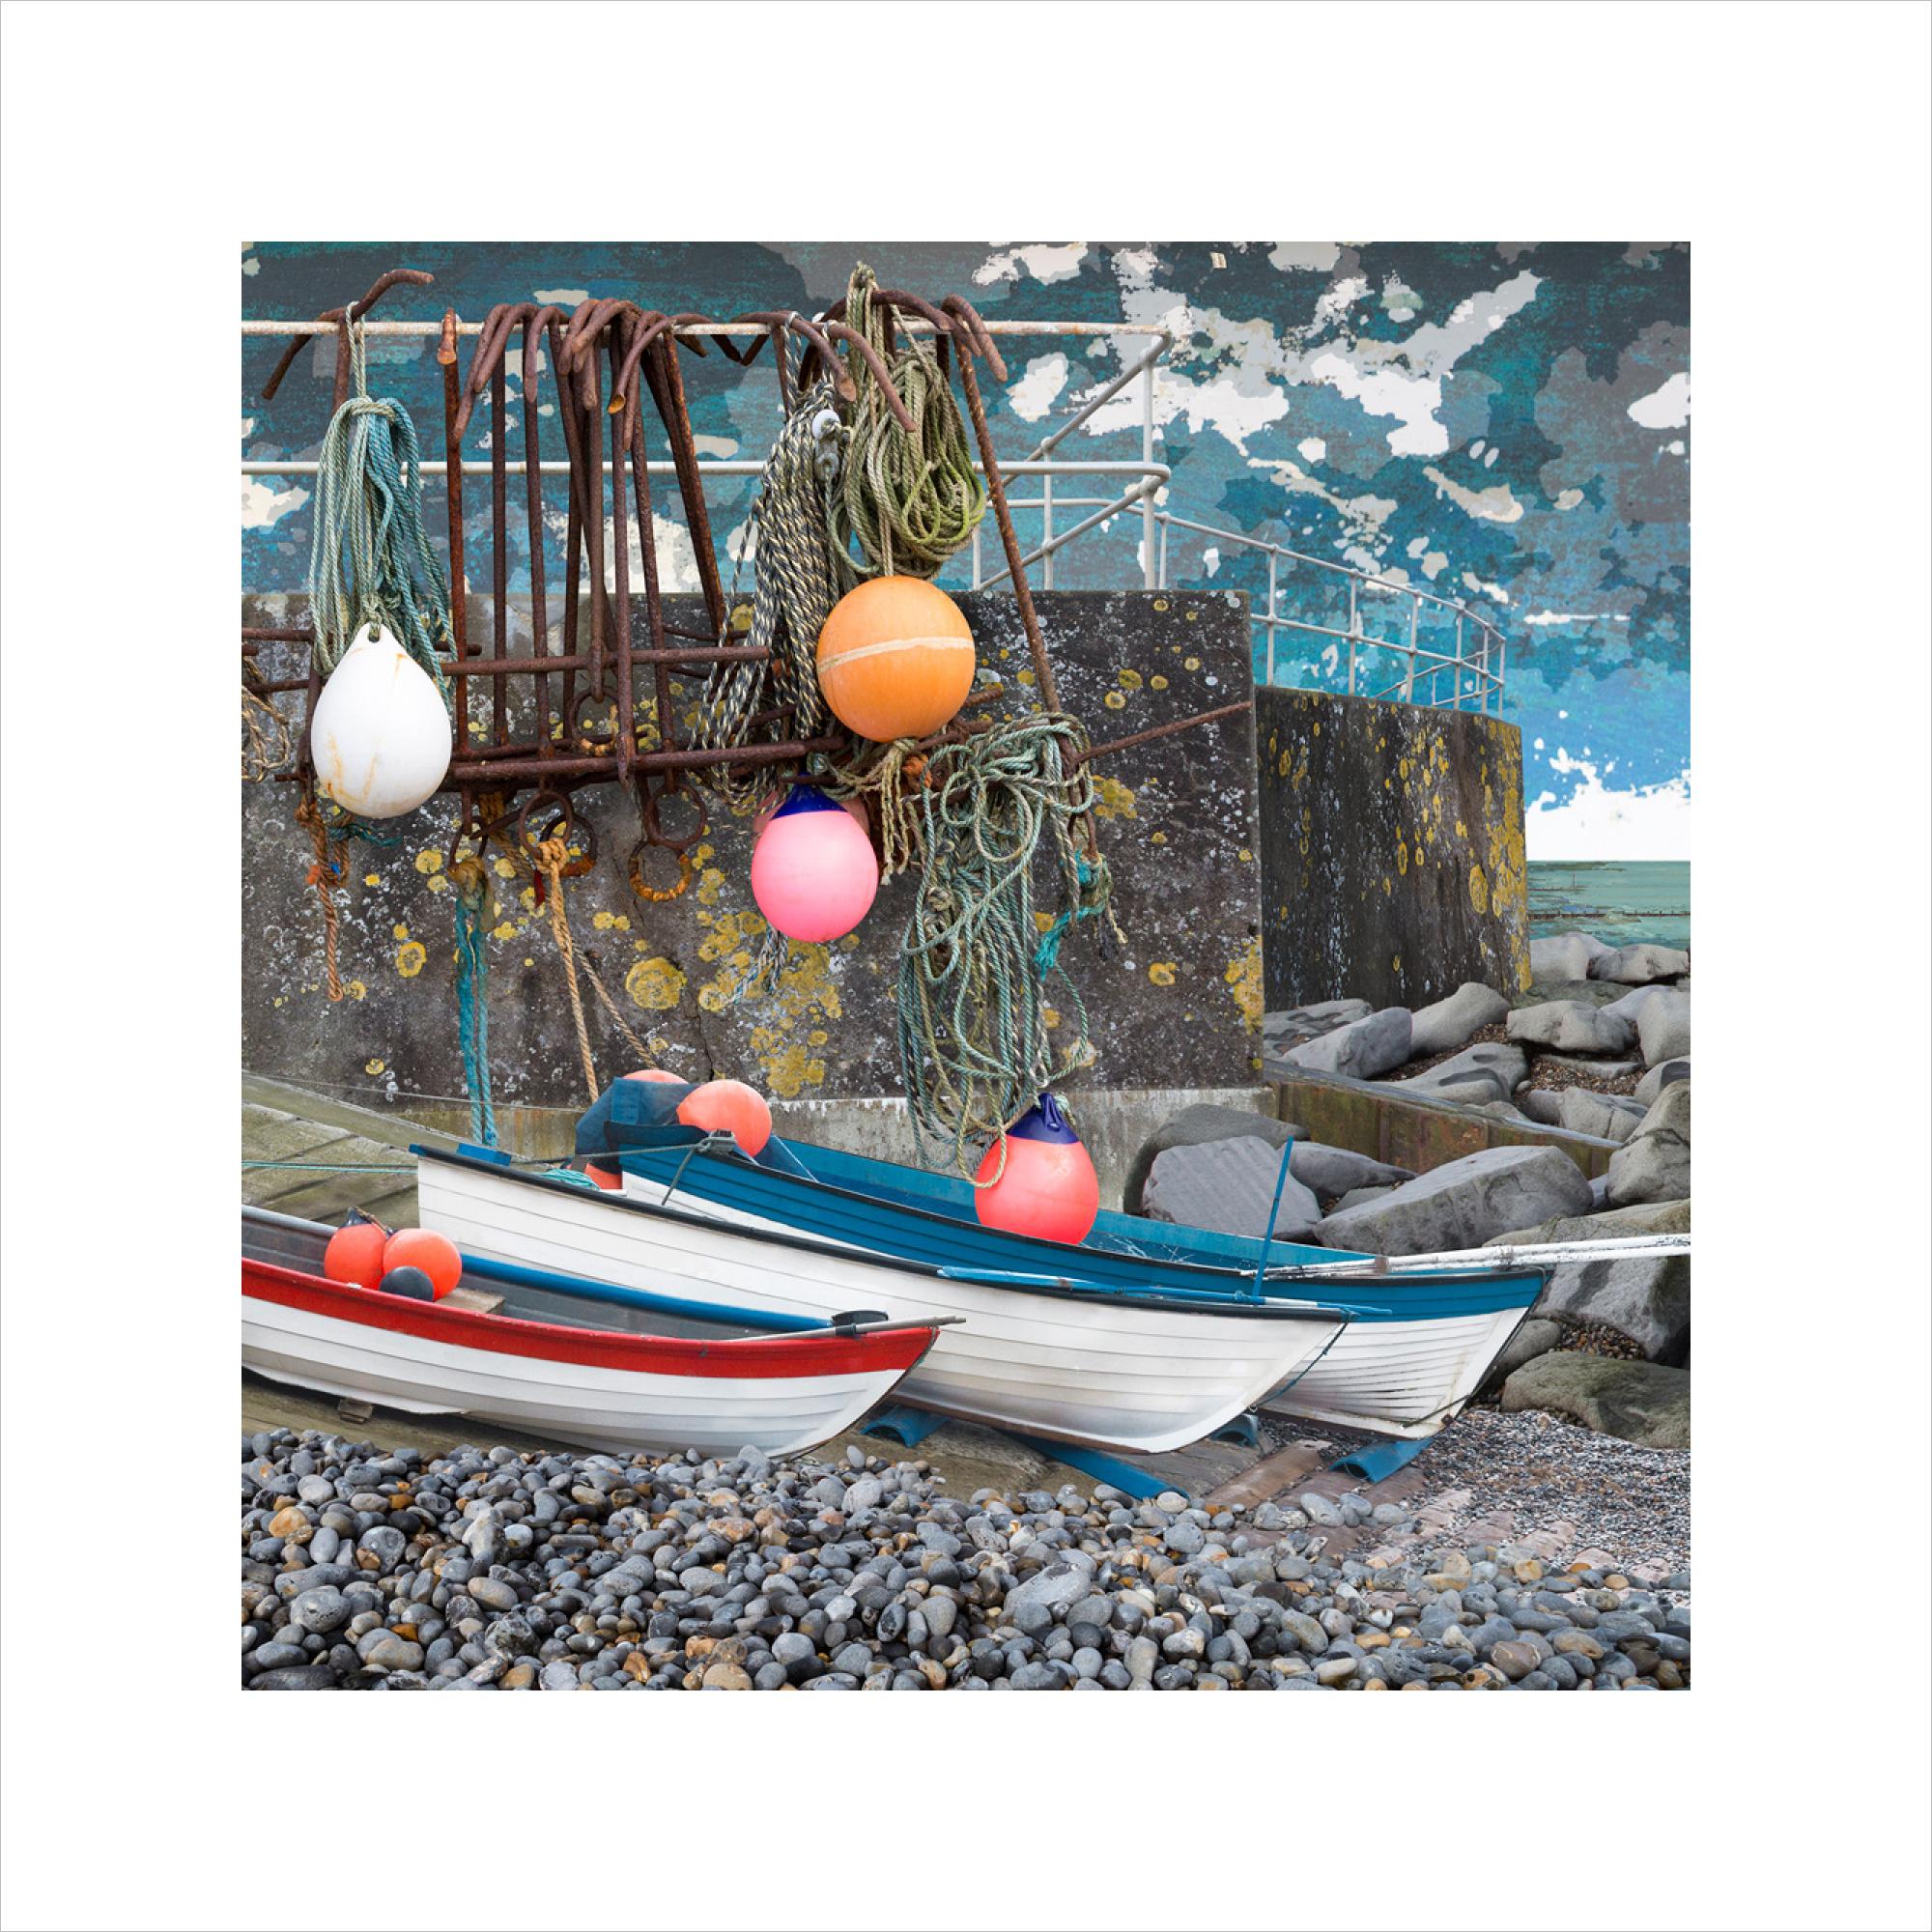 Claire Gill, Limited edition prints, digital photomontage, fine art prints, hahnemuhle, coastal art, Collect Art, seascape 55, Sheringham, North Norfolk